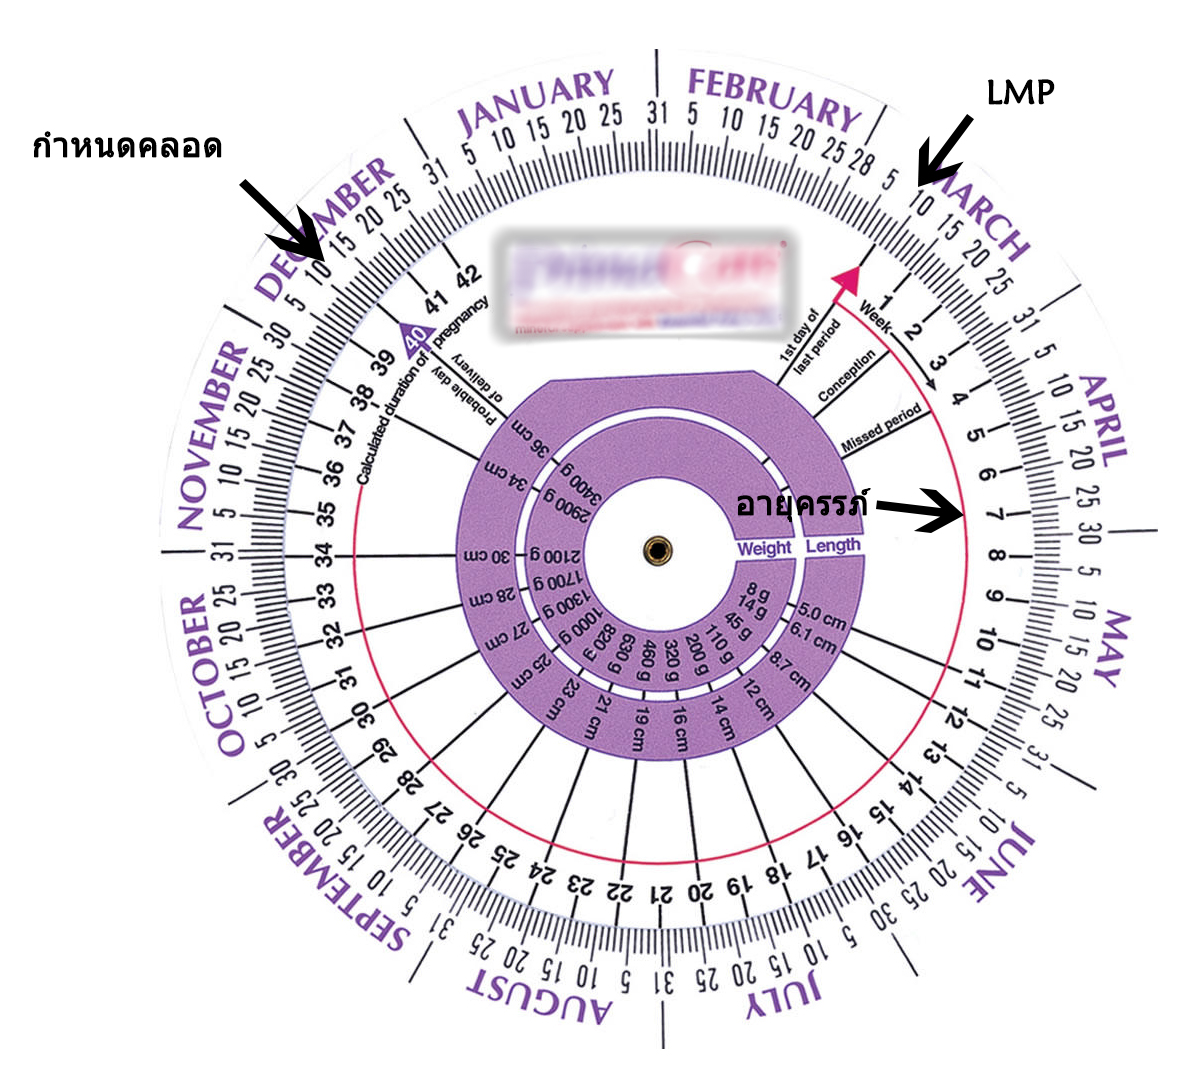 Pdr инструмент: принцип технологии и процесс рихтовки